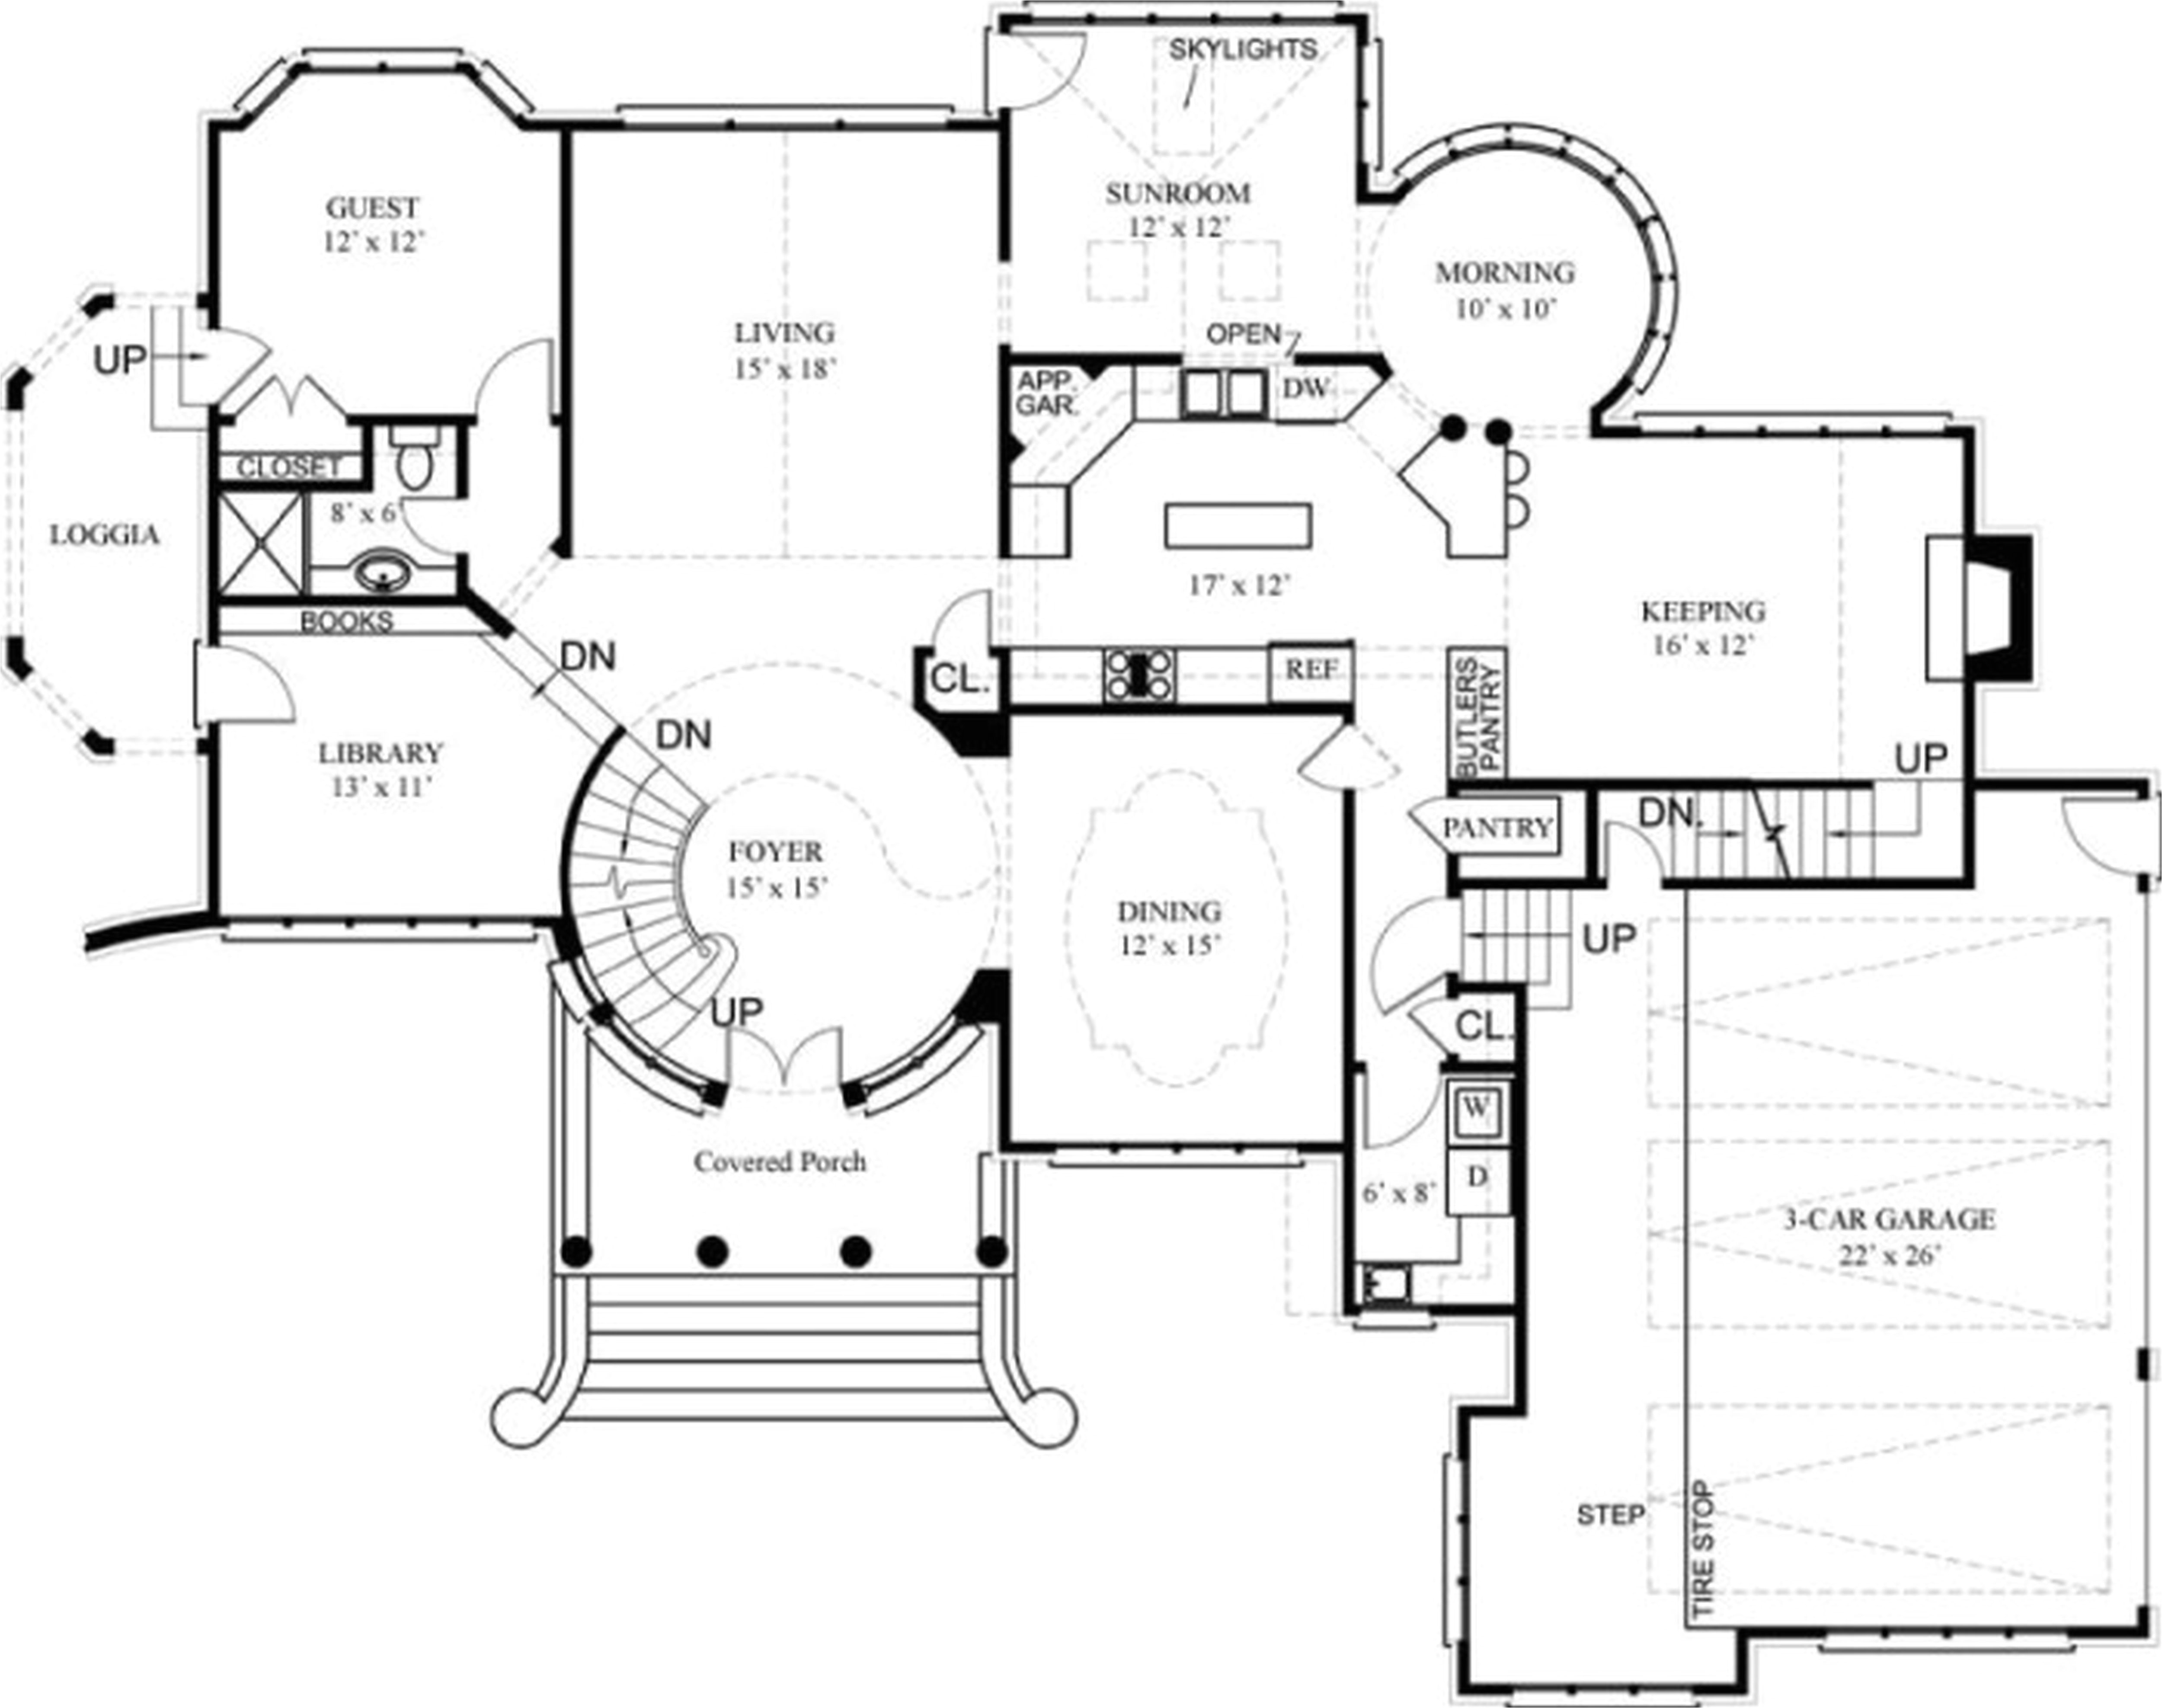 designs and floor plans tritmonk design photo gallery for modern bedroom interior floor plan s layouts furniture drawing